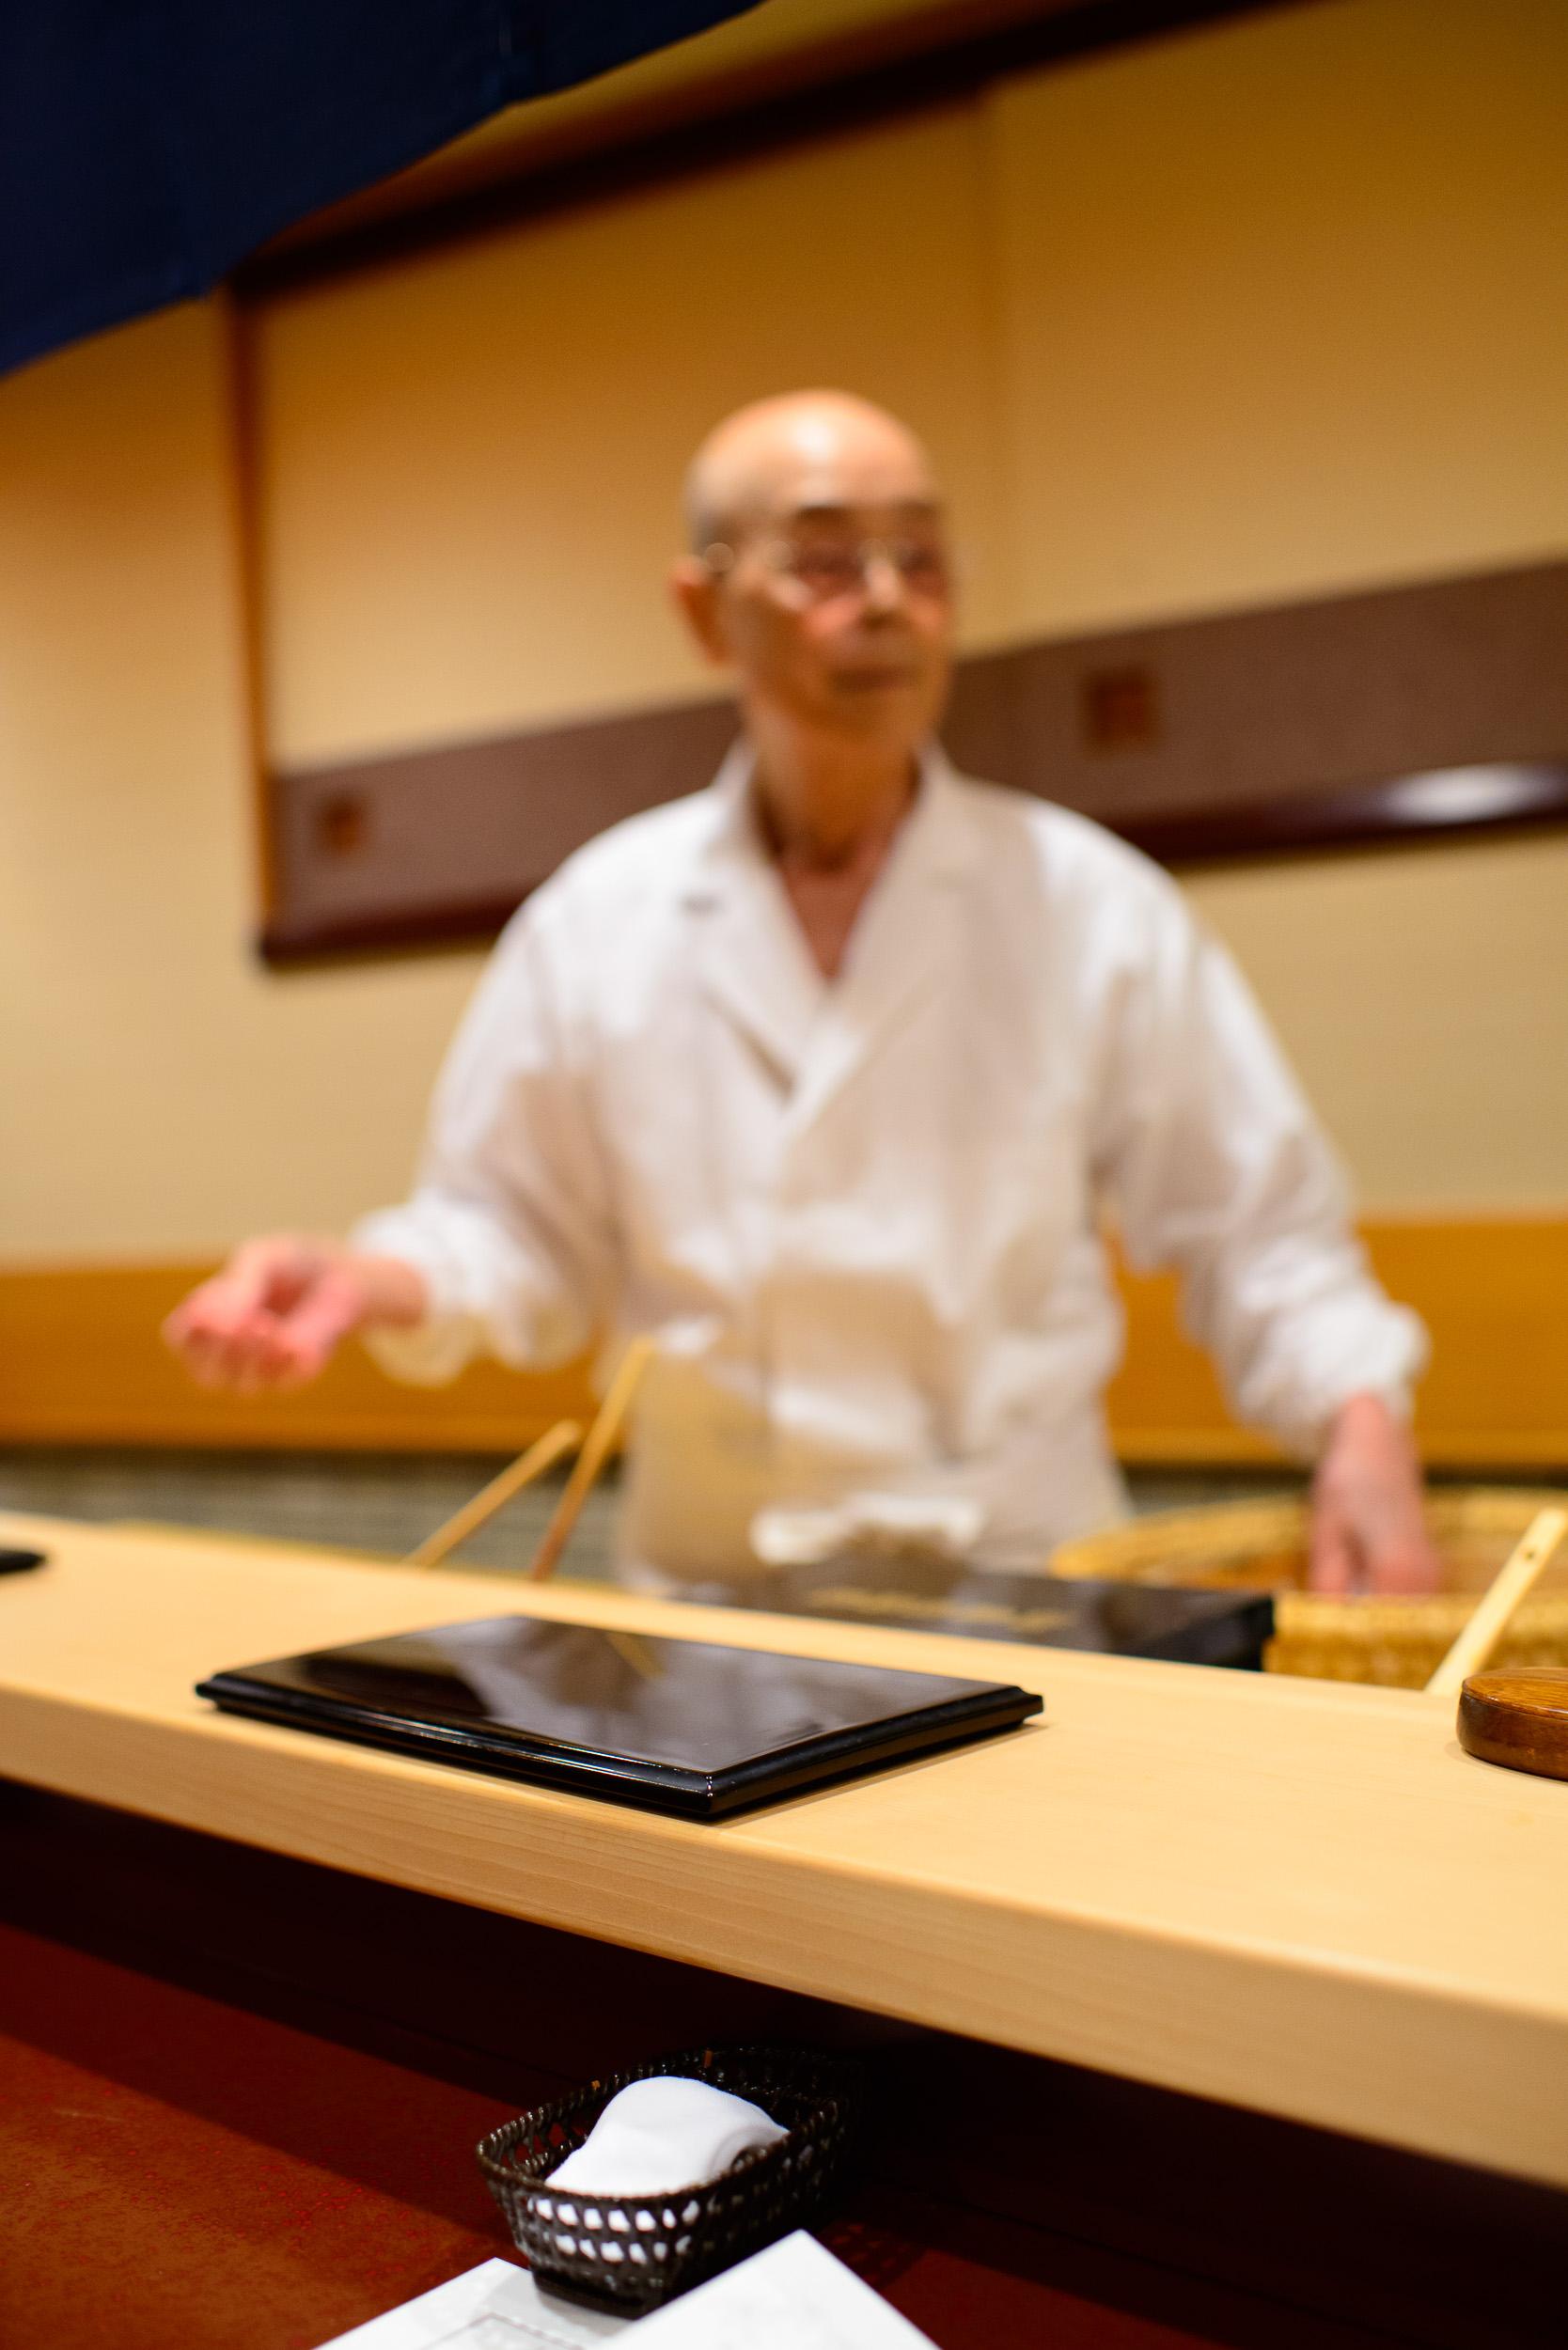 Chef Jiro Ono